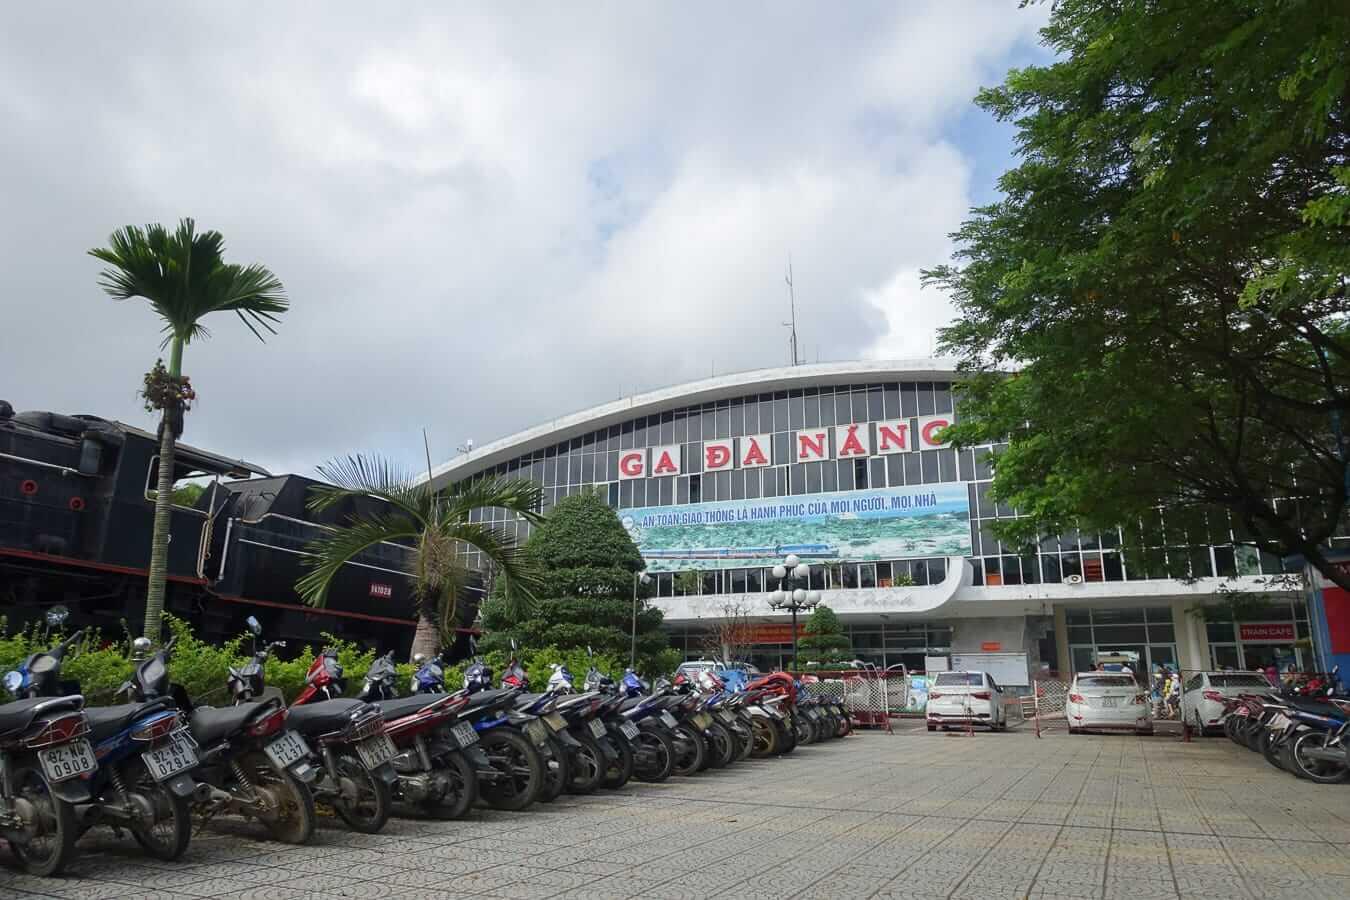 Da Nang train station parking lot